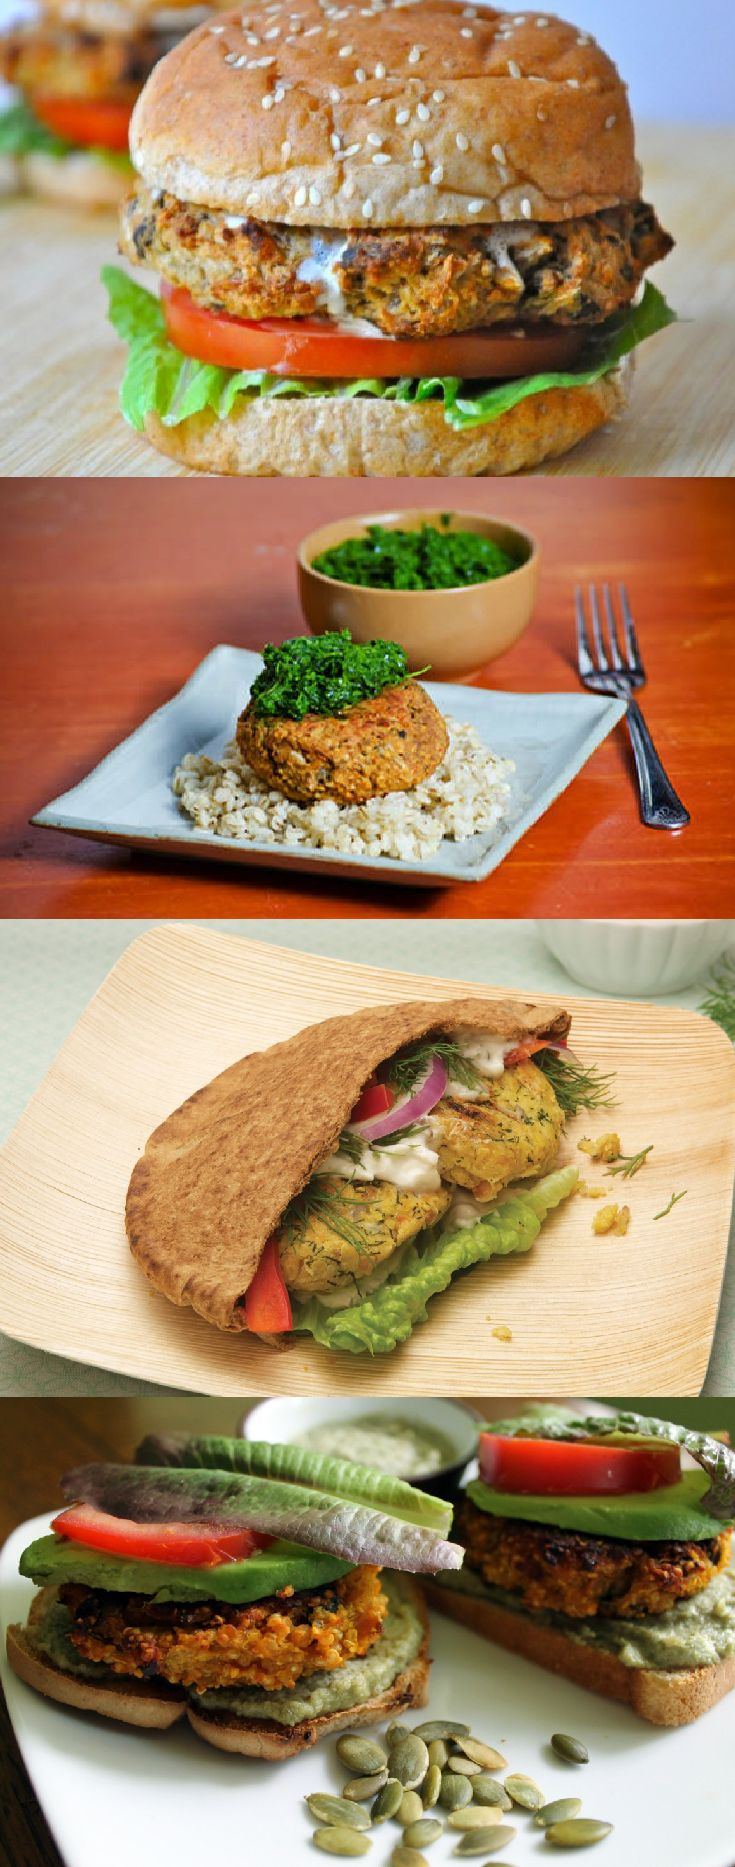 http://onegr.pl/18Km5eL #vegan #vegetarian #healthy #homemade #diy #veggie #burgers #tips #howto #food